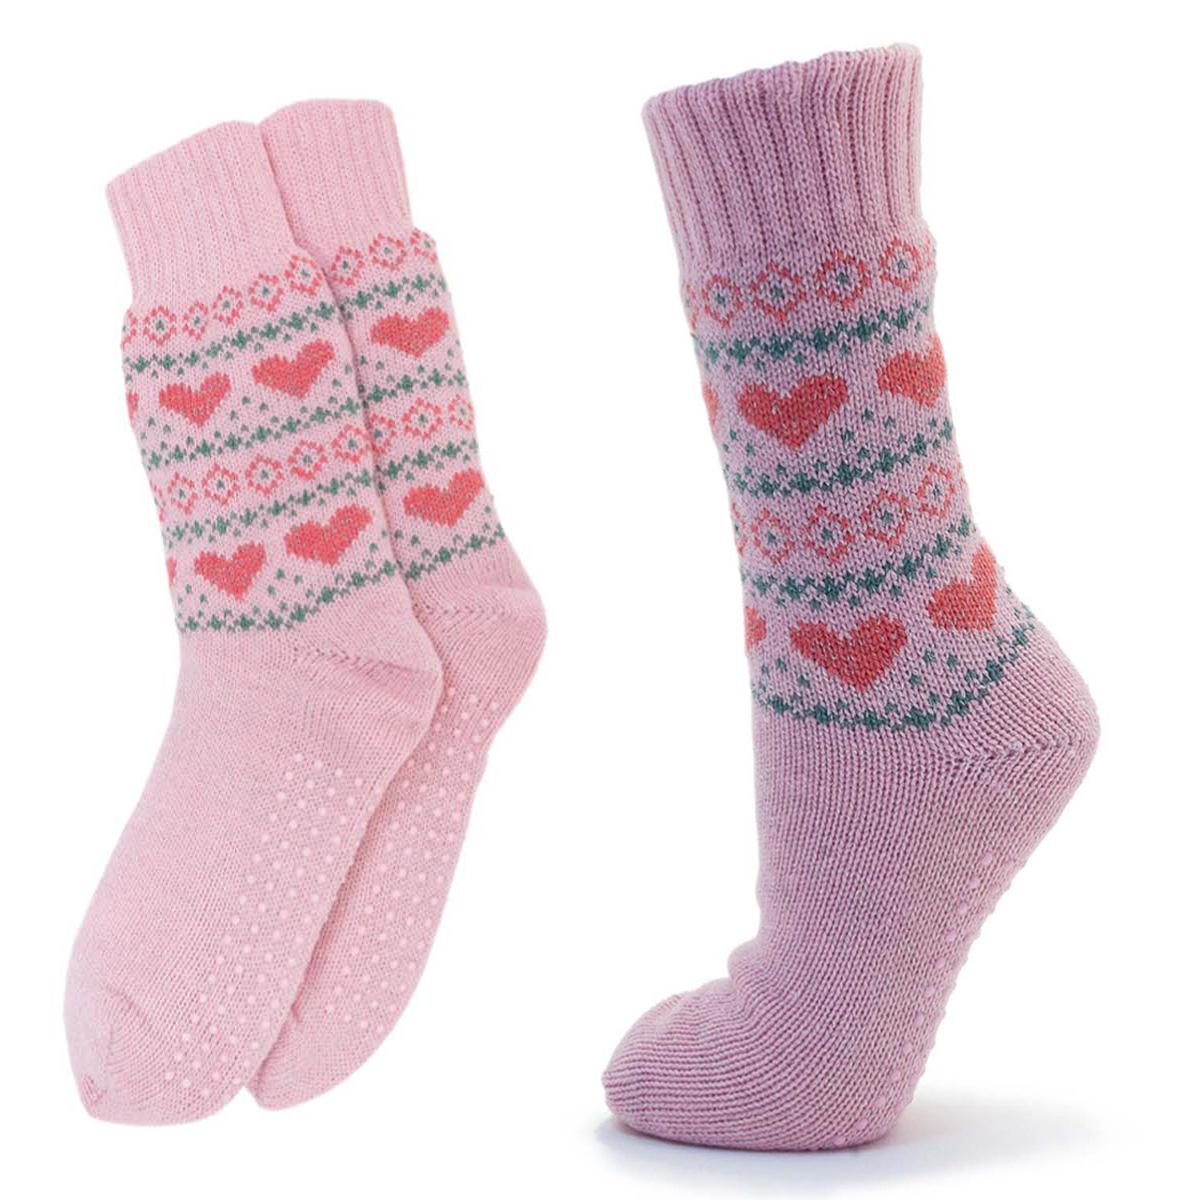 femmes sherpa bottine cheville chaussettes chaussons tricot fourrure ebay. Black Bedroom Furniture Sets. Home Design Ideas